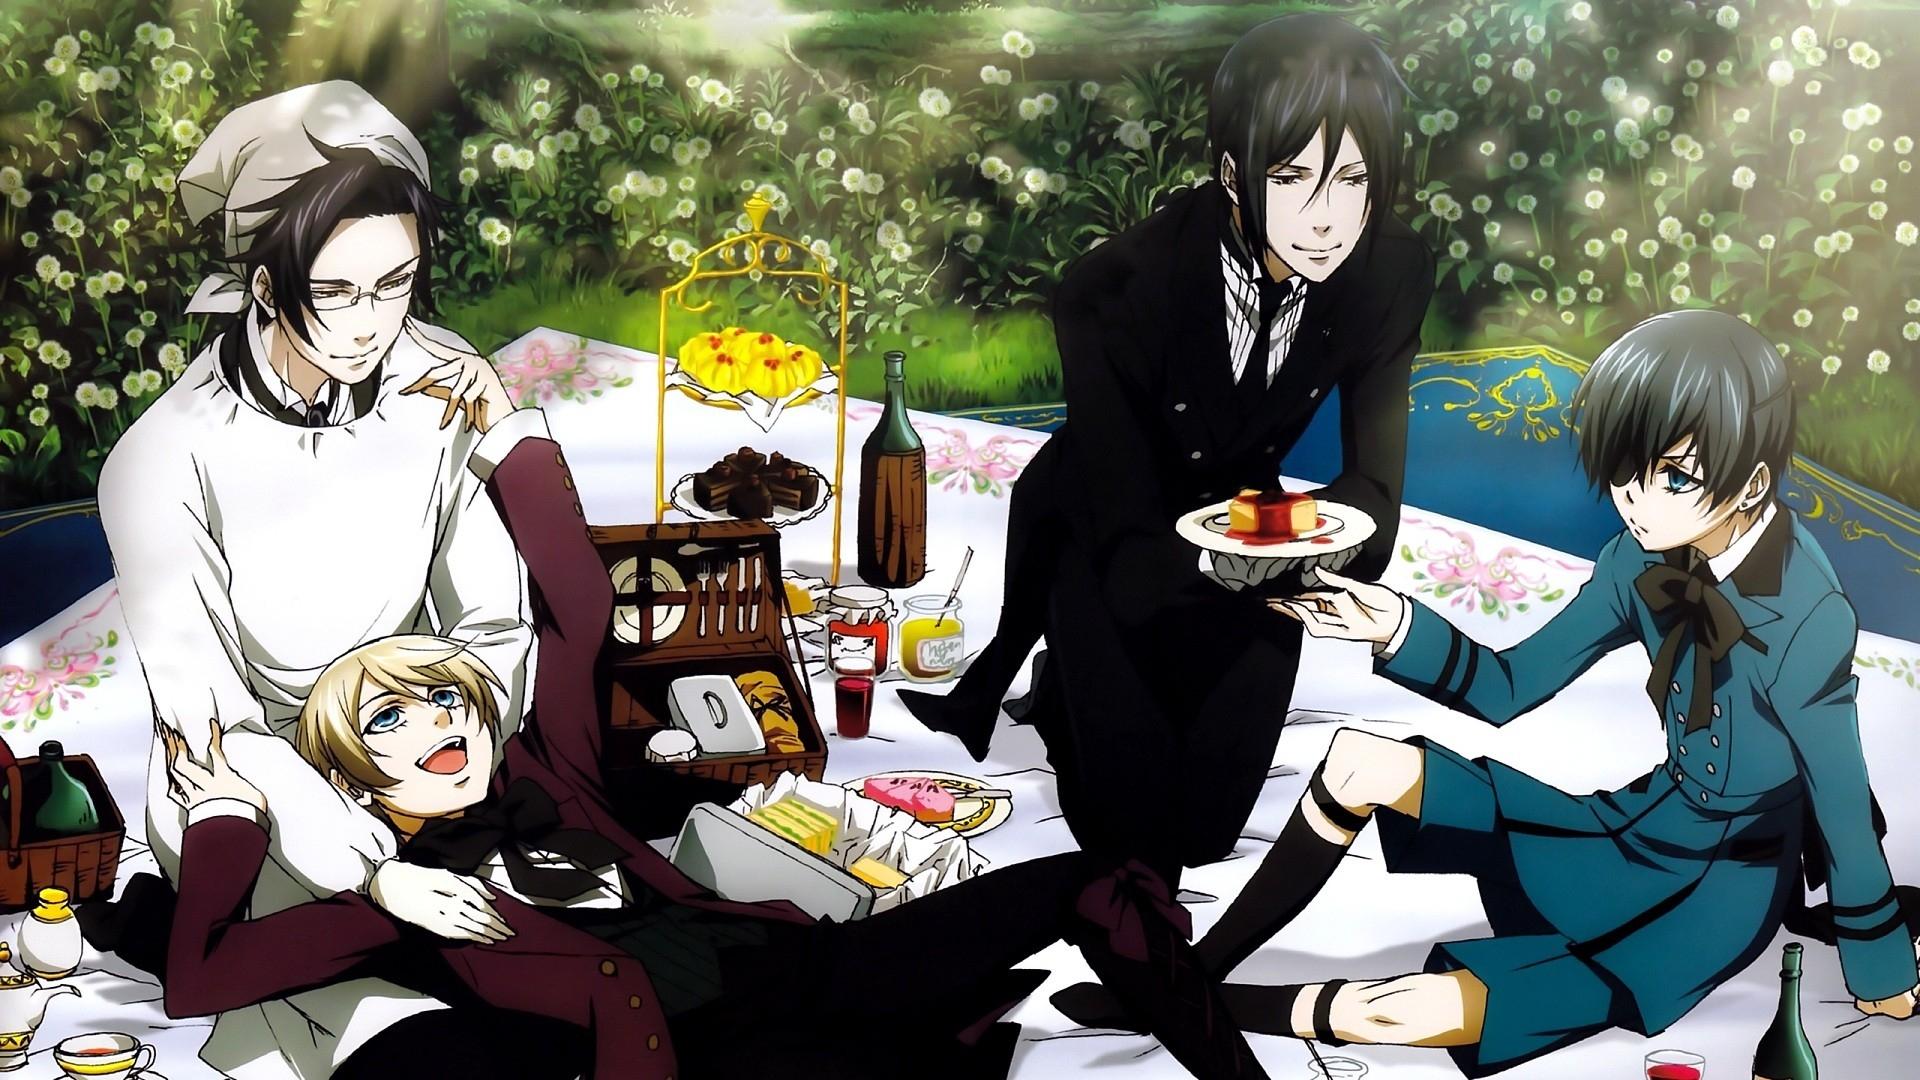 anime_rest_picnics_nature_treat_23157_1920x1080